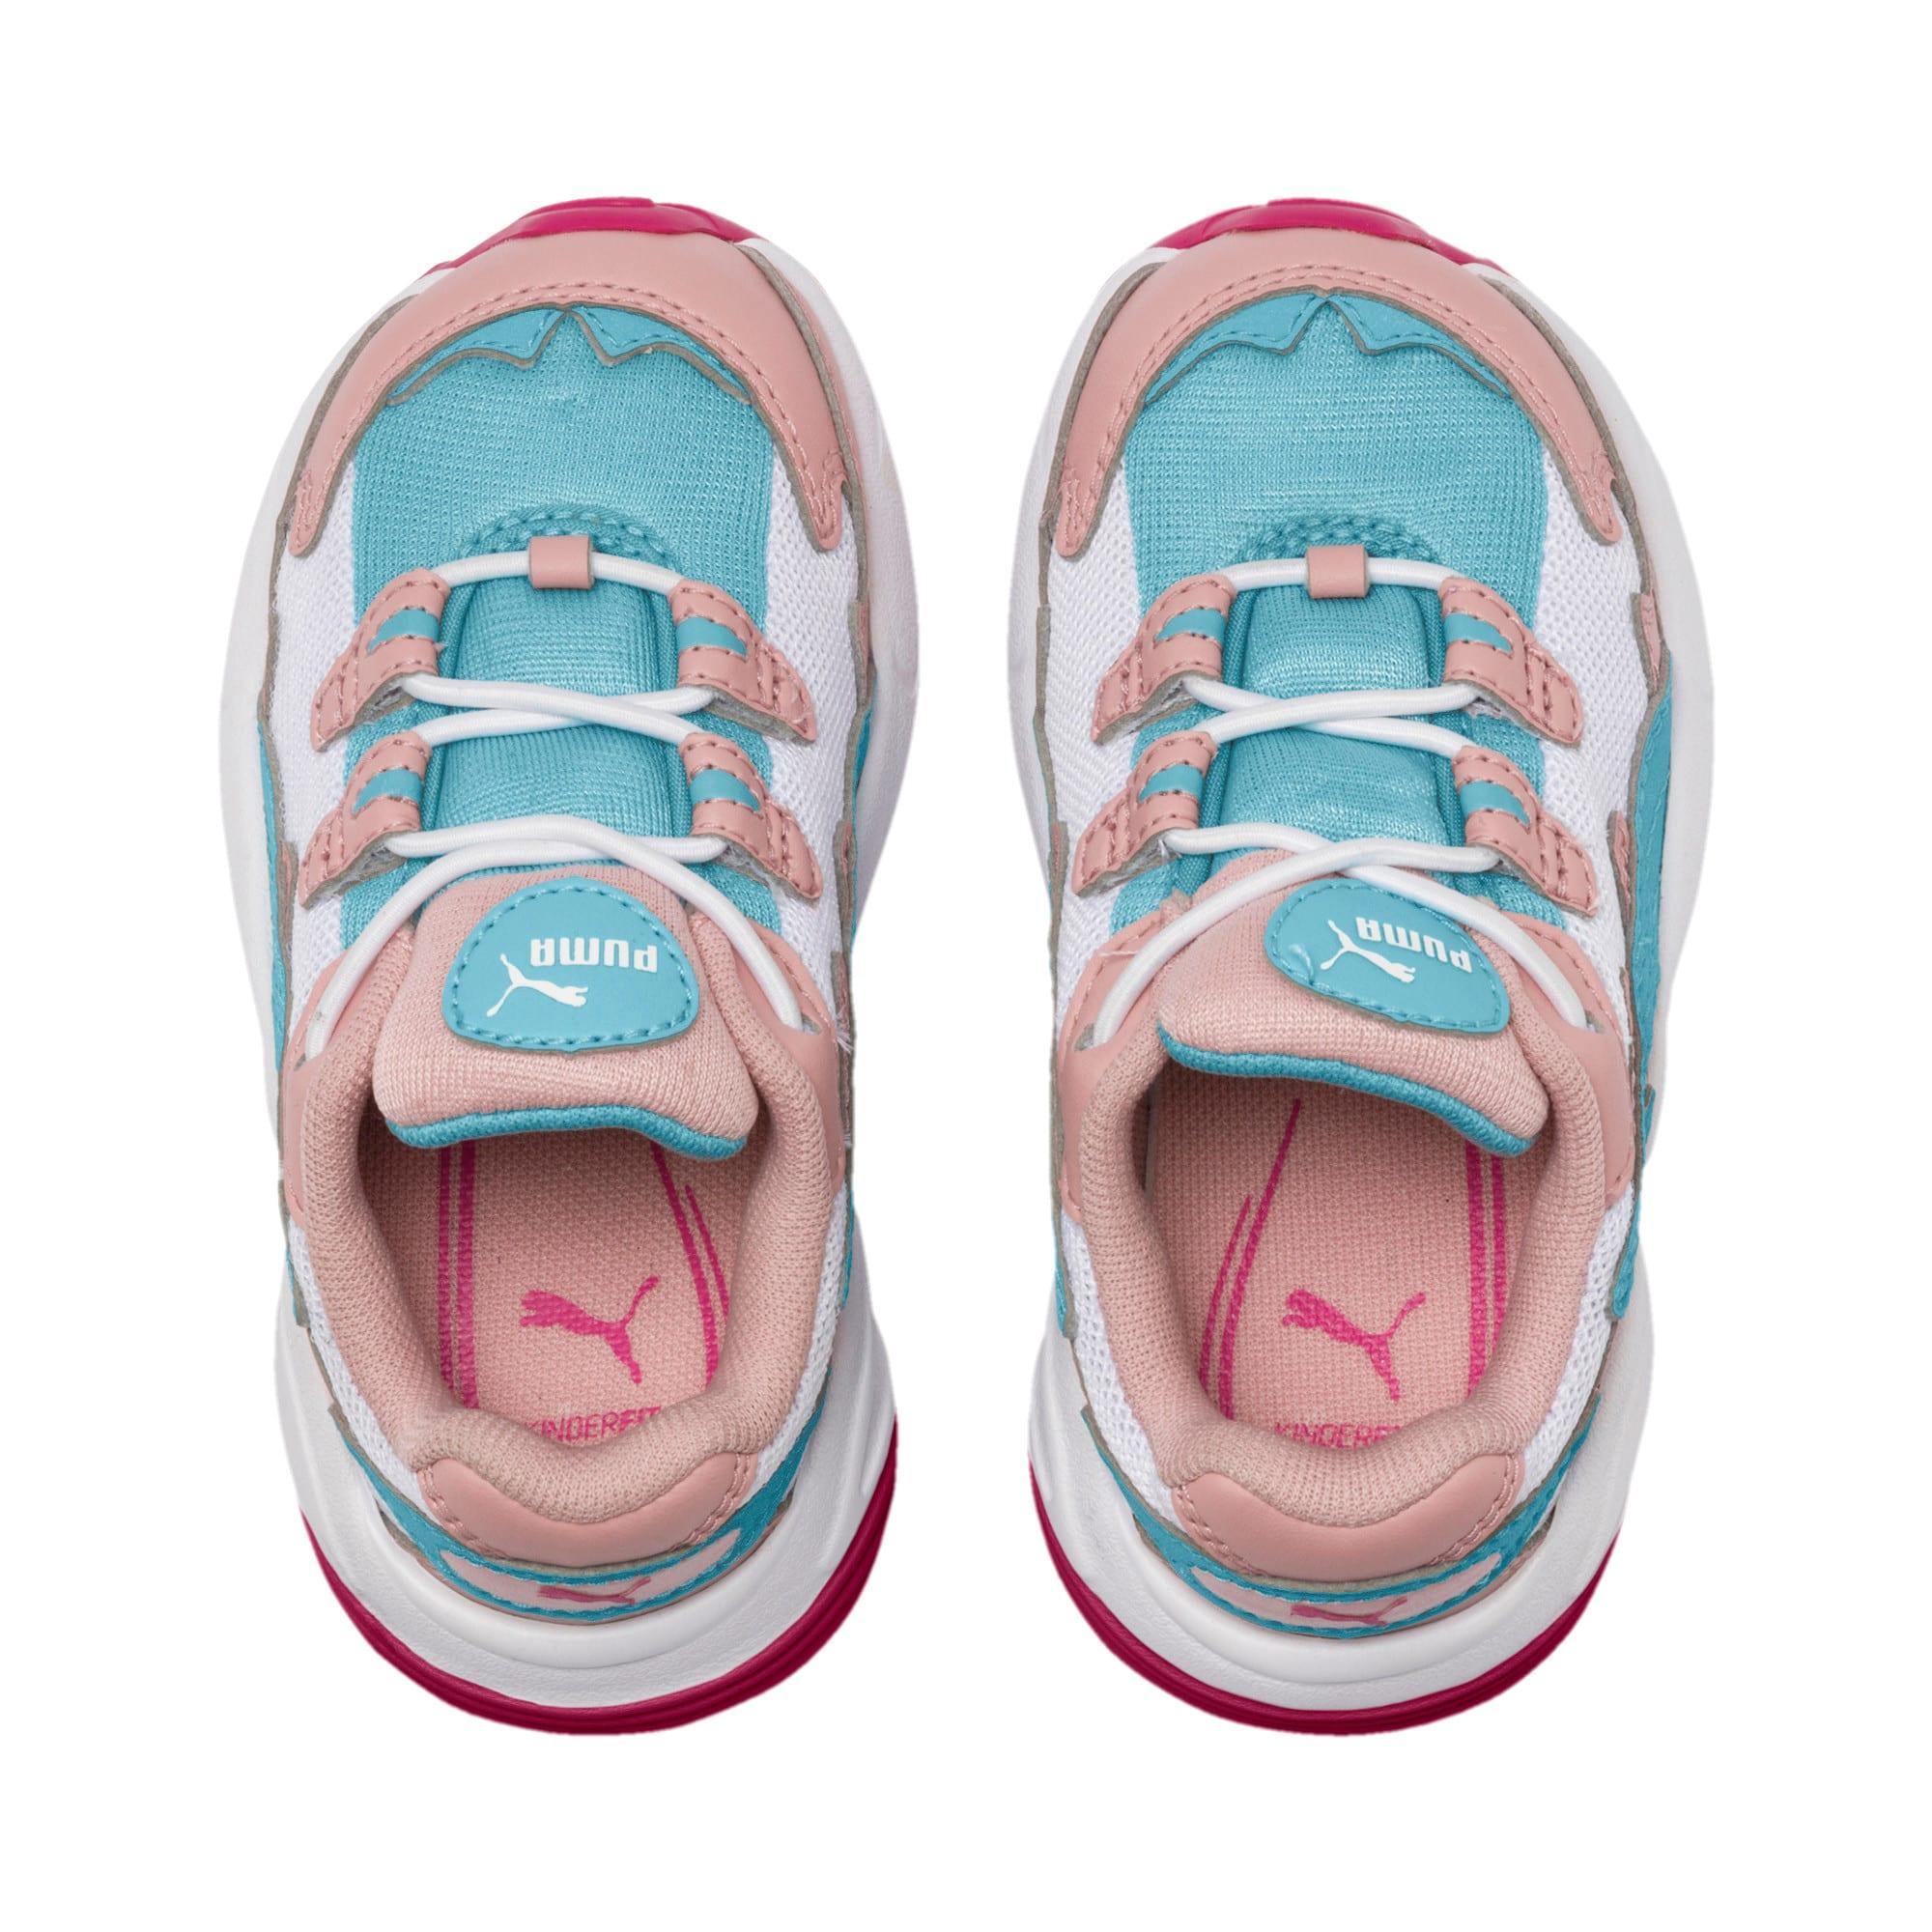 Thumbnail 6 of CELL Alien Cosmic Kleinkinder Sneaker, Bridal Rose-Milky Blue, medium